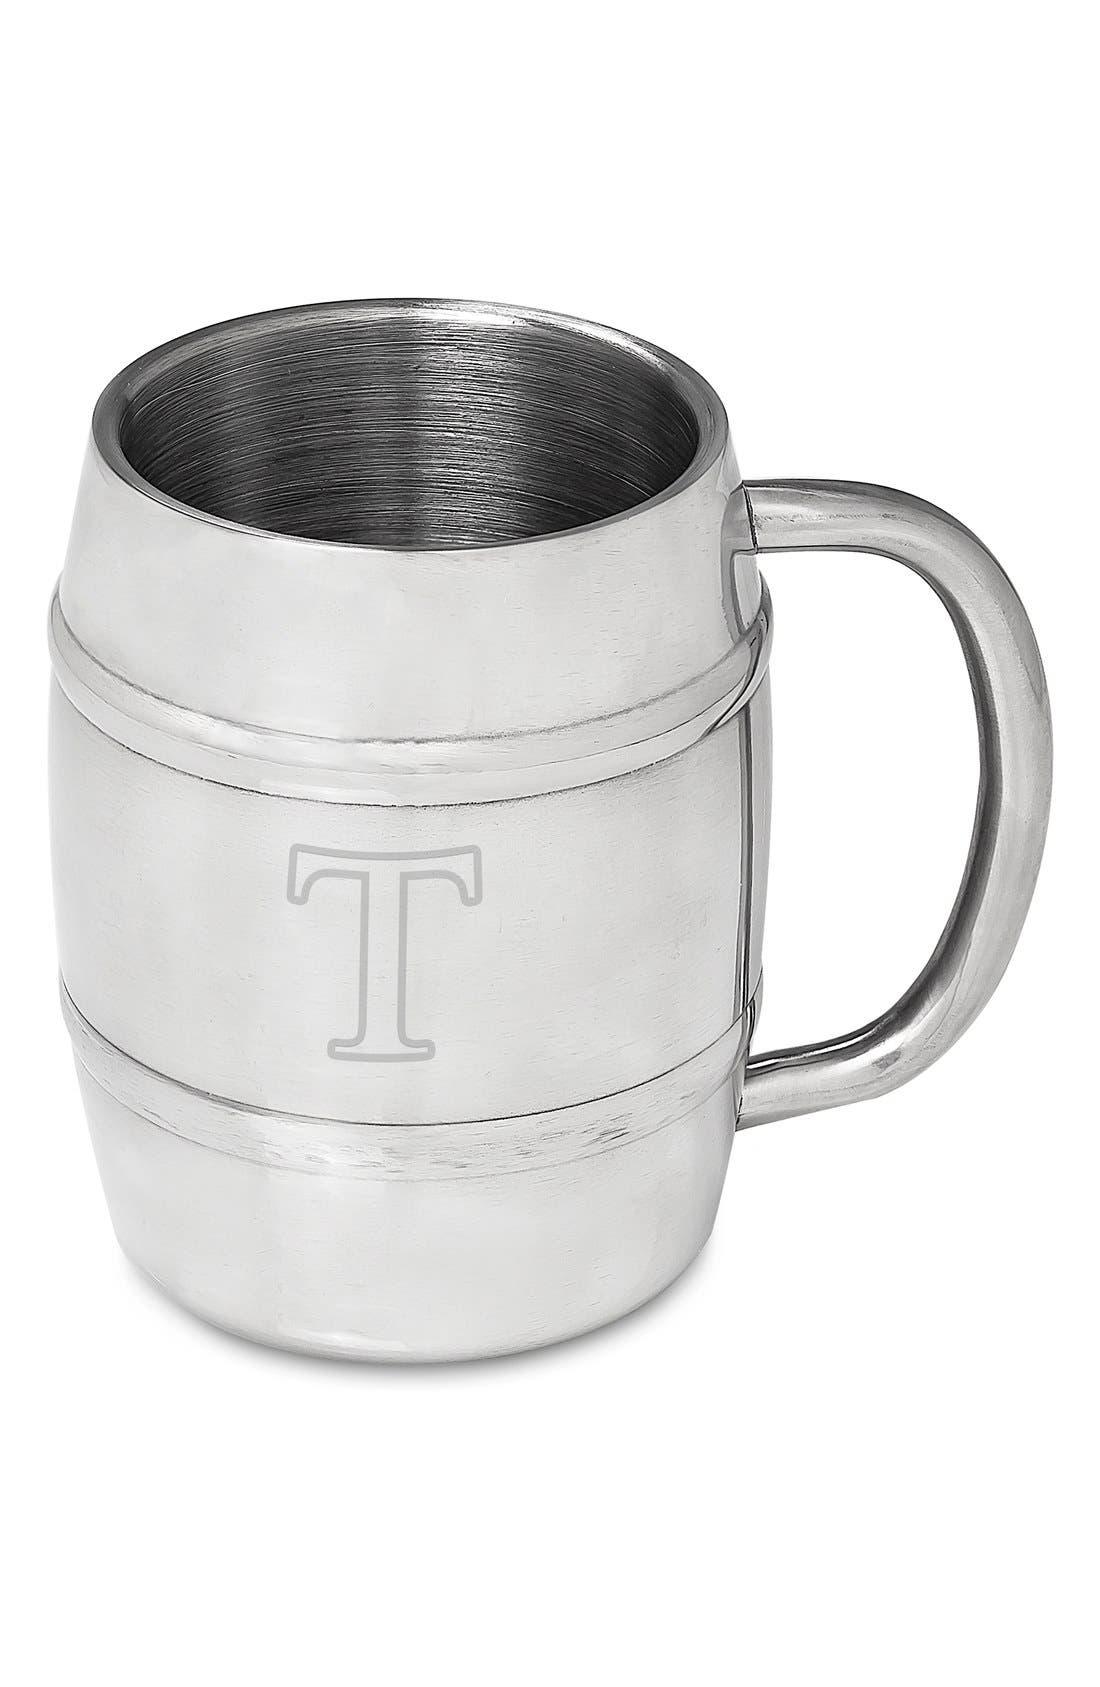 Monogram Stainless Steel Keg Mug,                         Main,                         color,